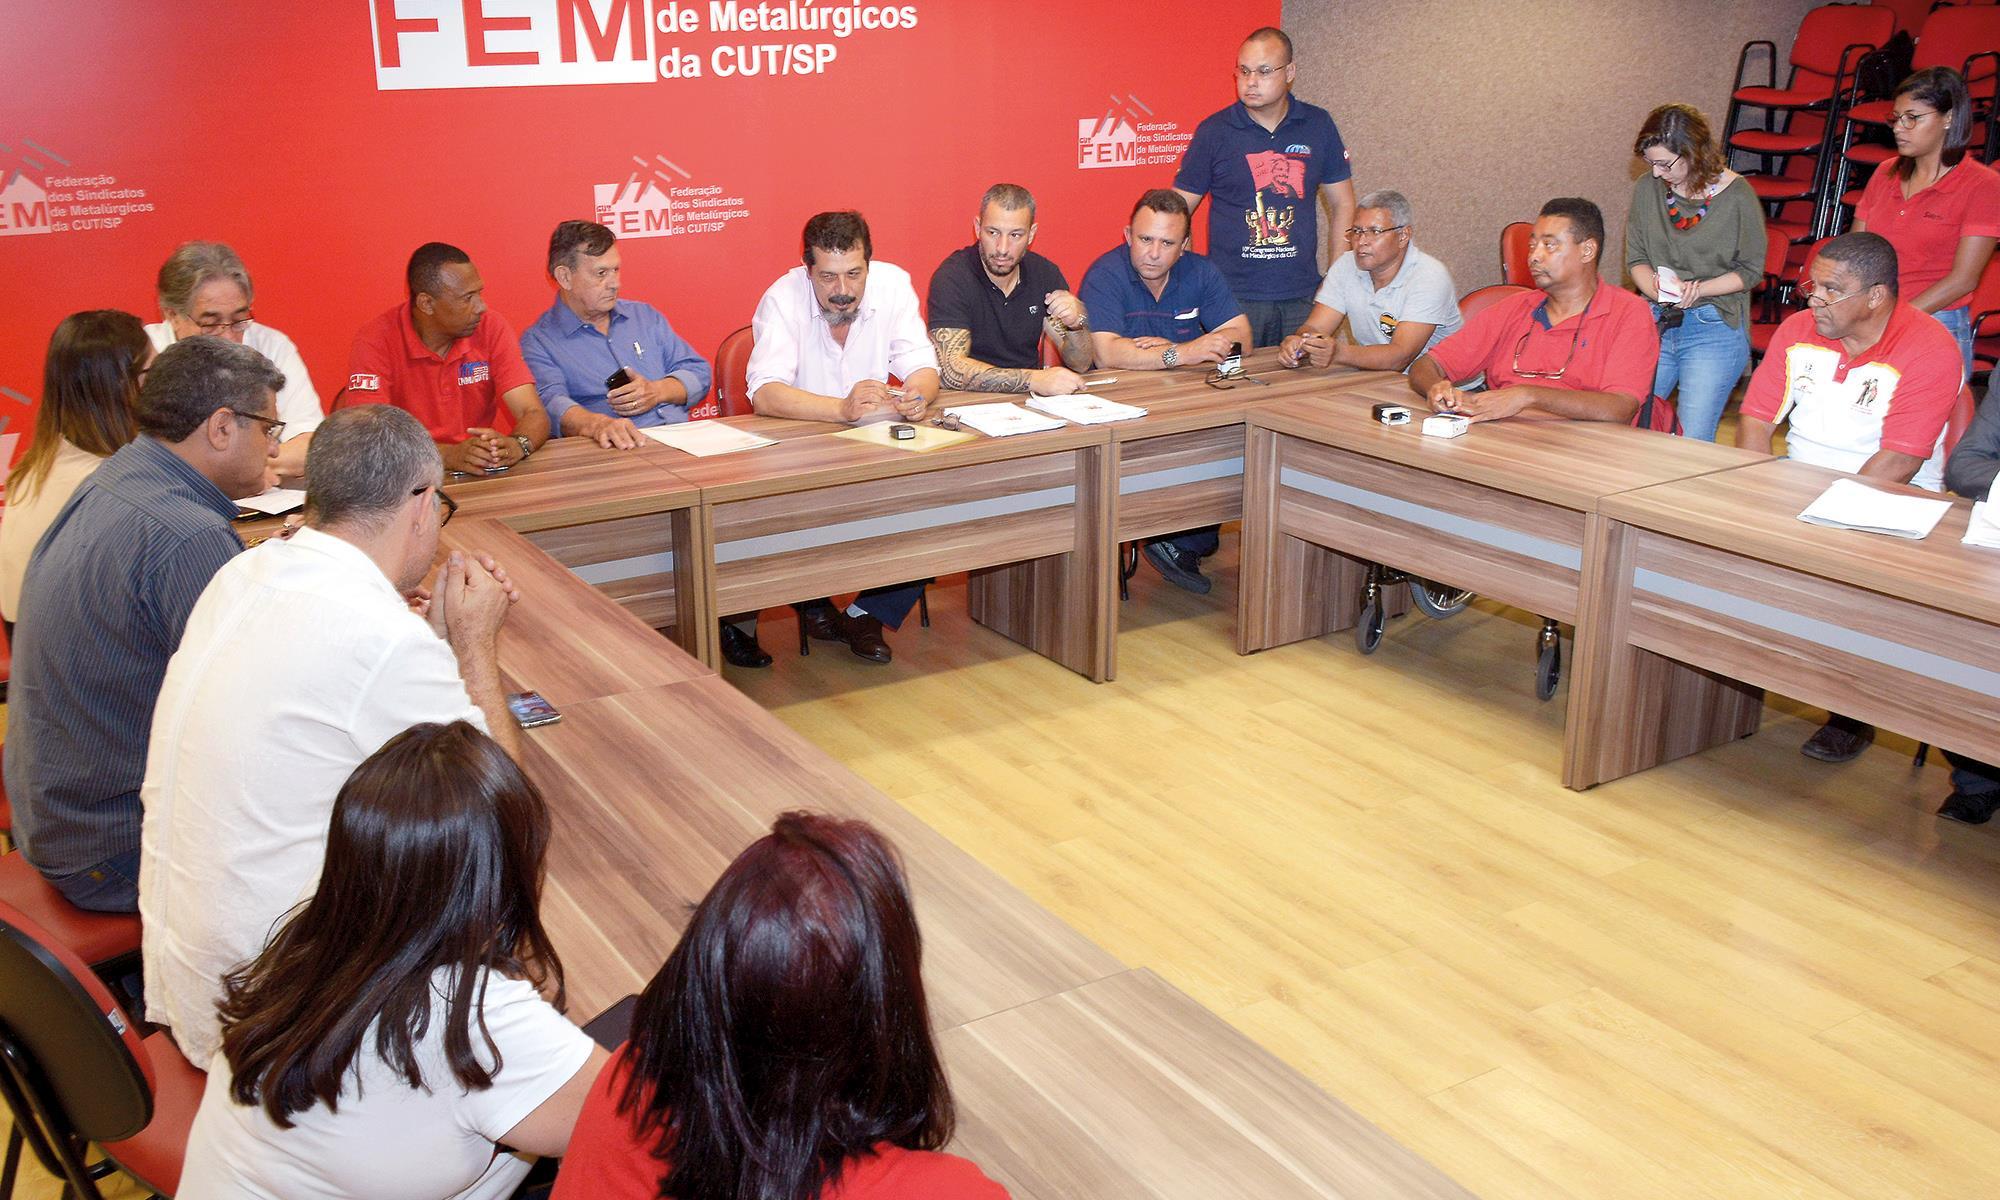 Estado de SP: Campanha Salarial beneficia mais de 138 mil metalúrgicos